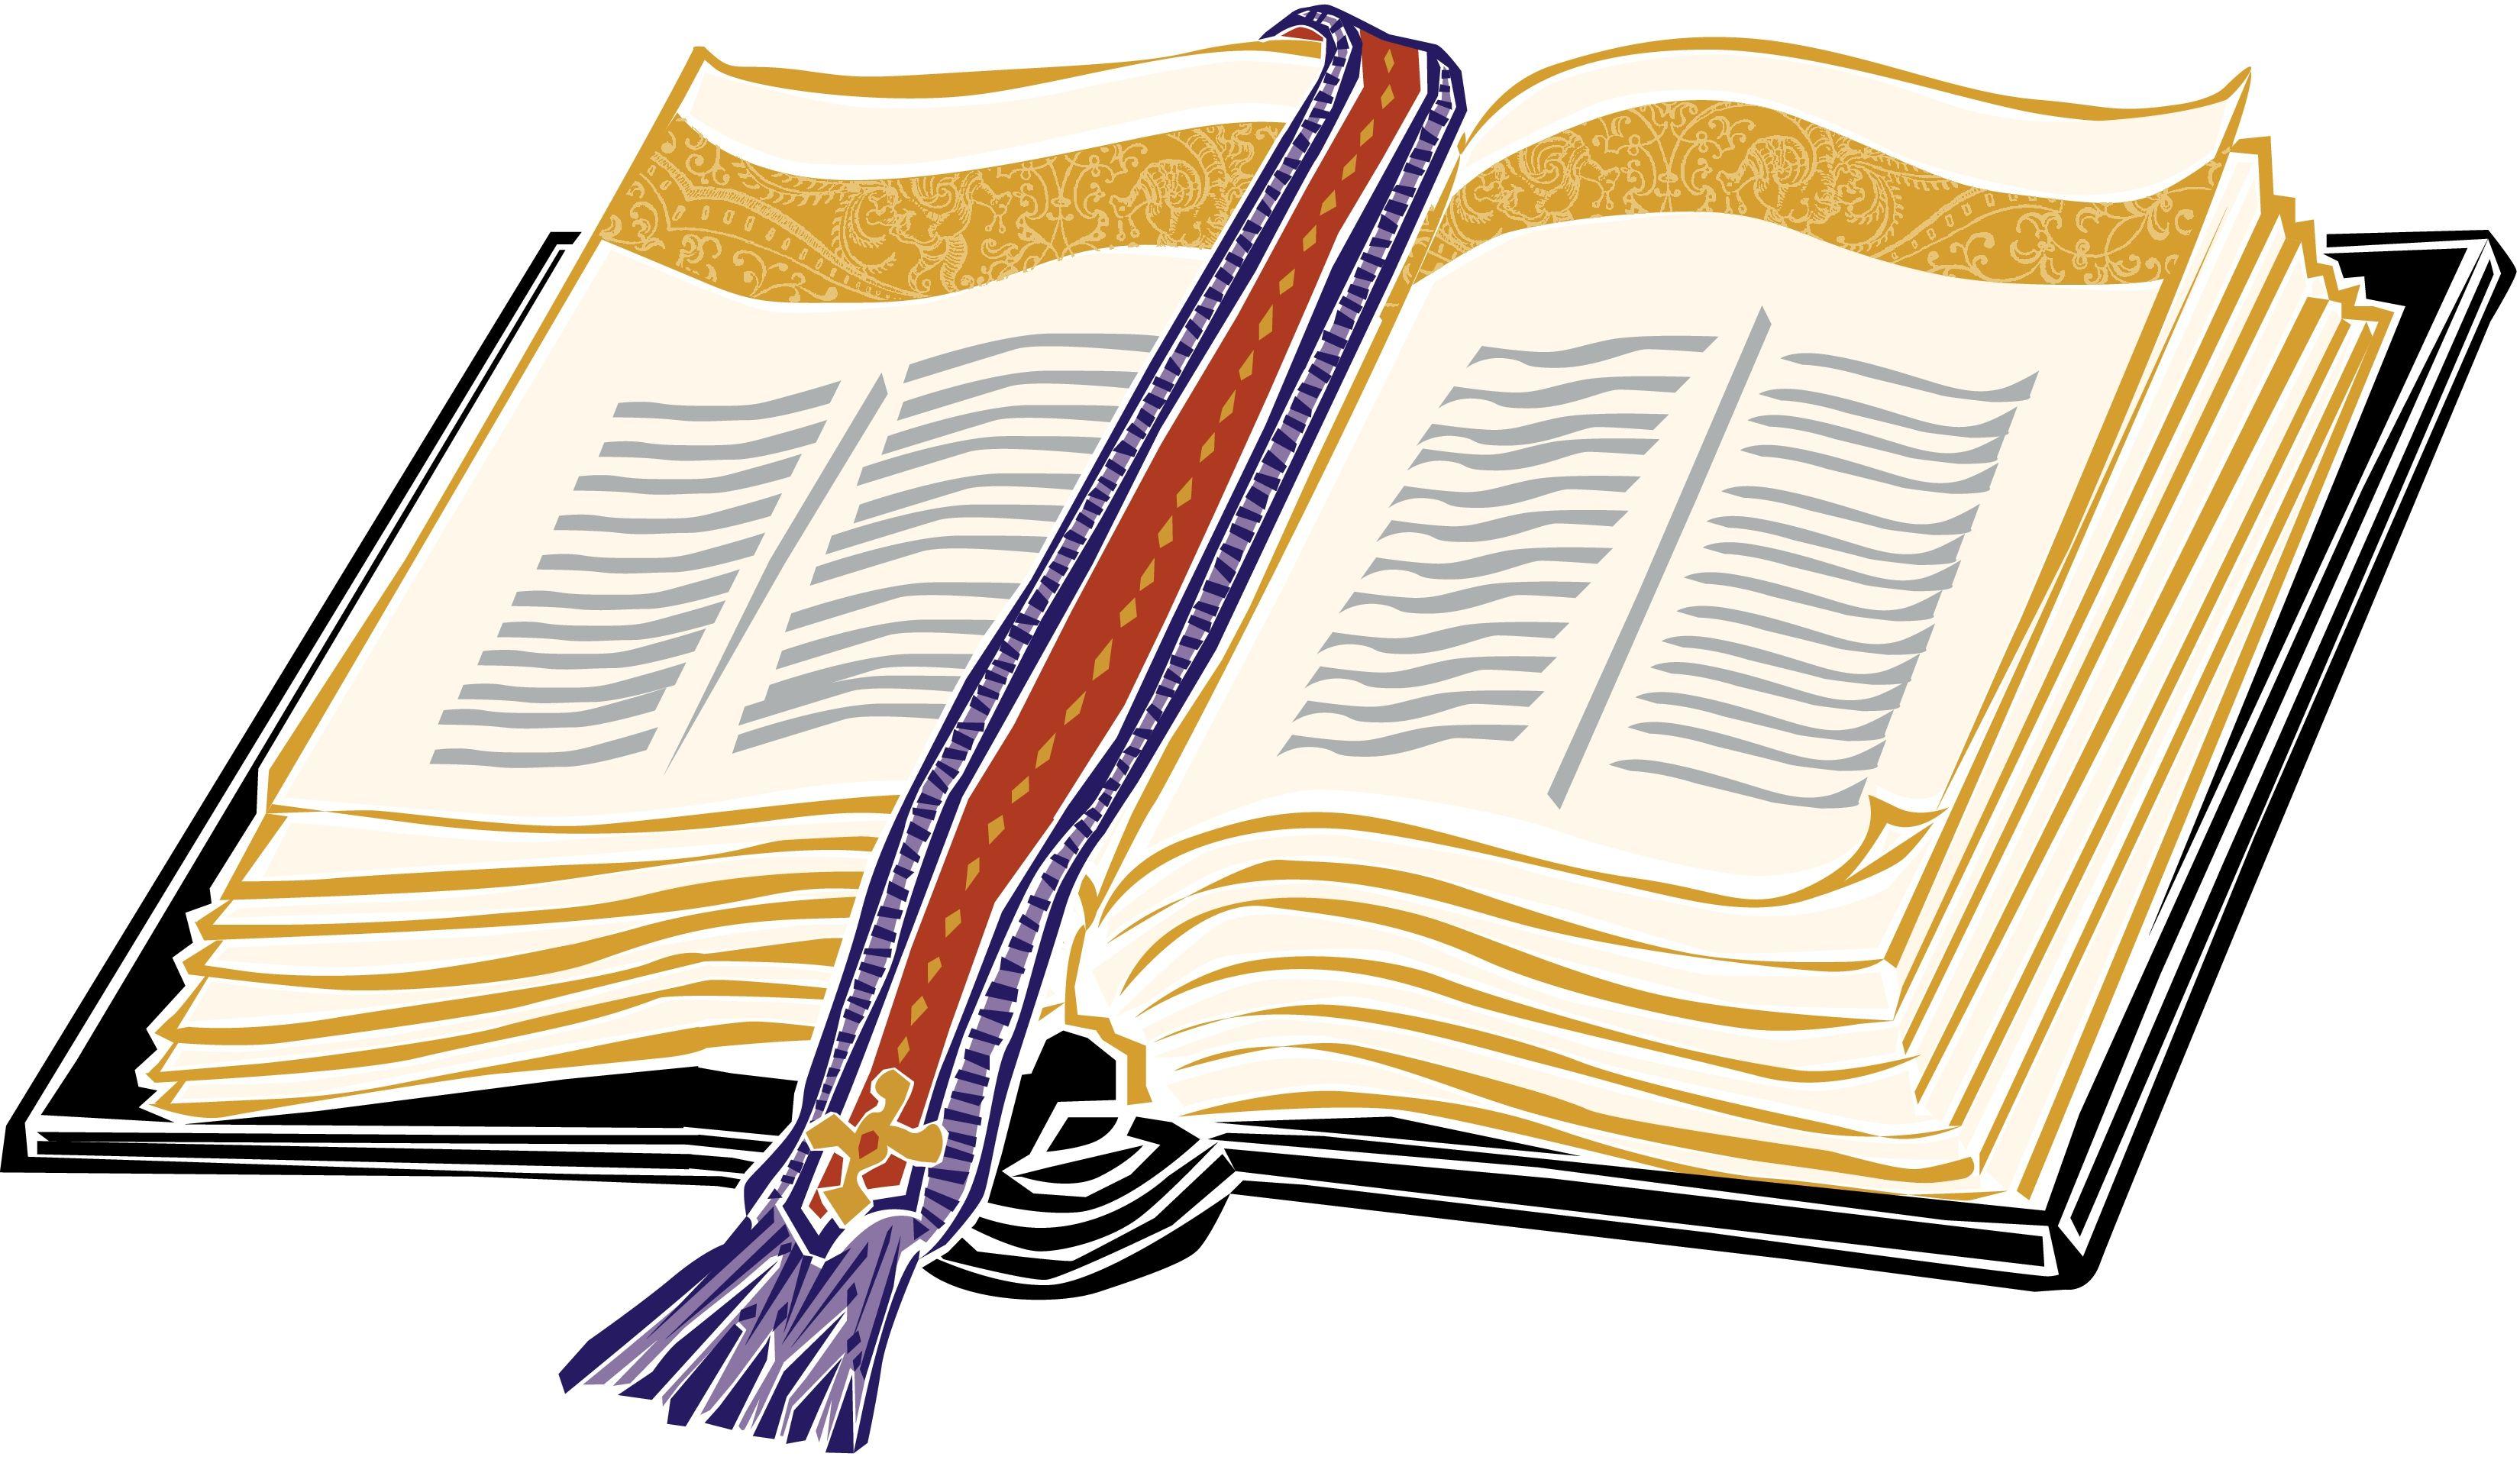 Bible clipart. Gold open christian kid